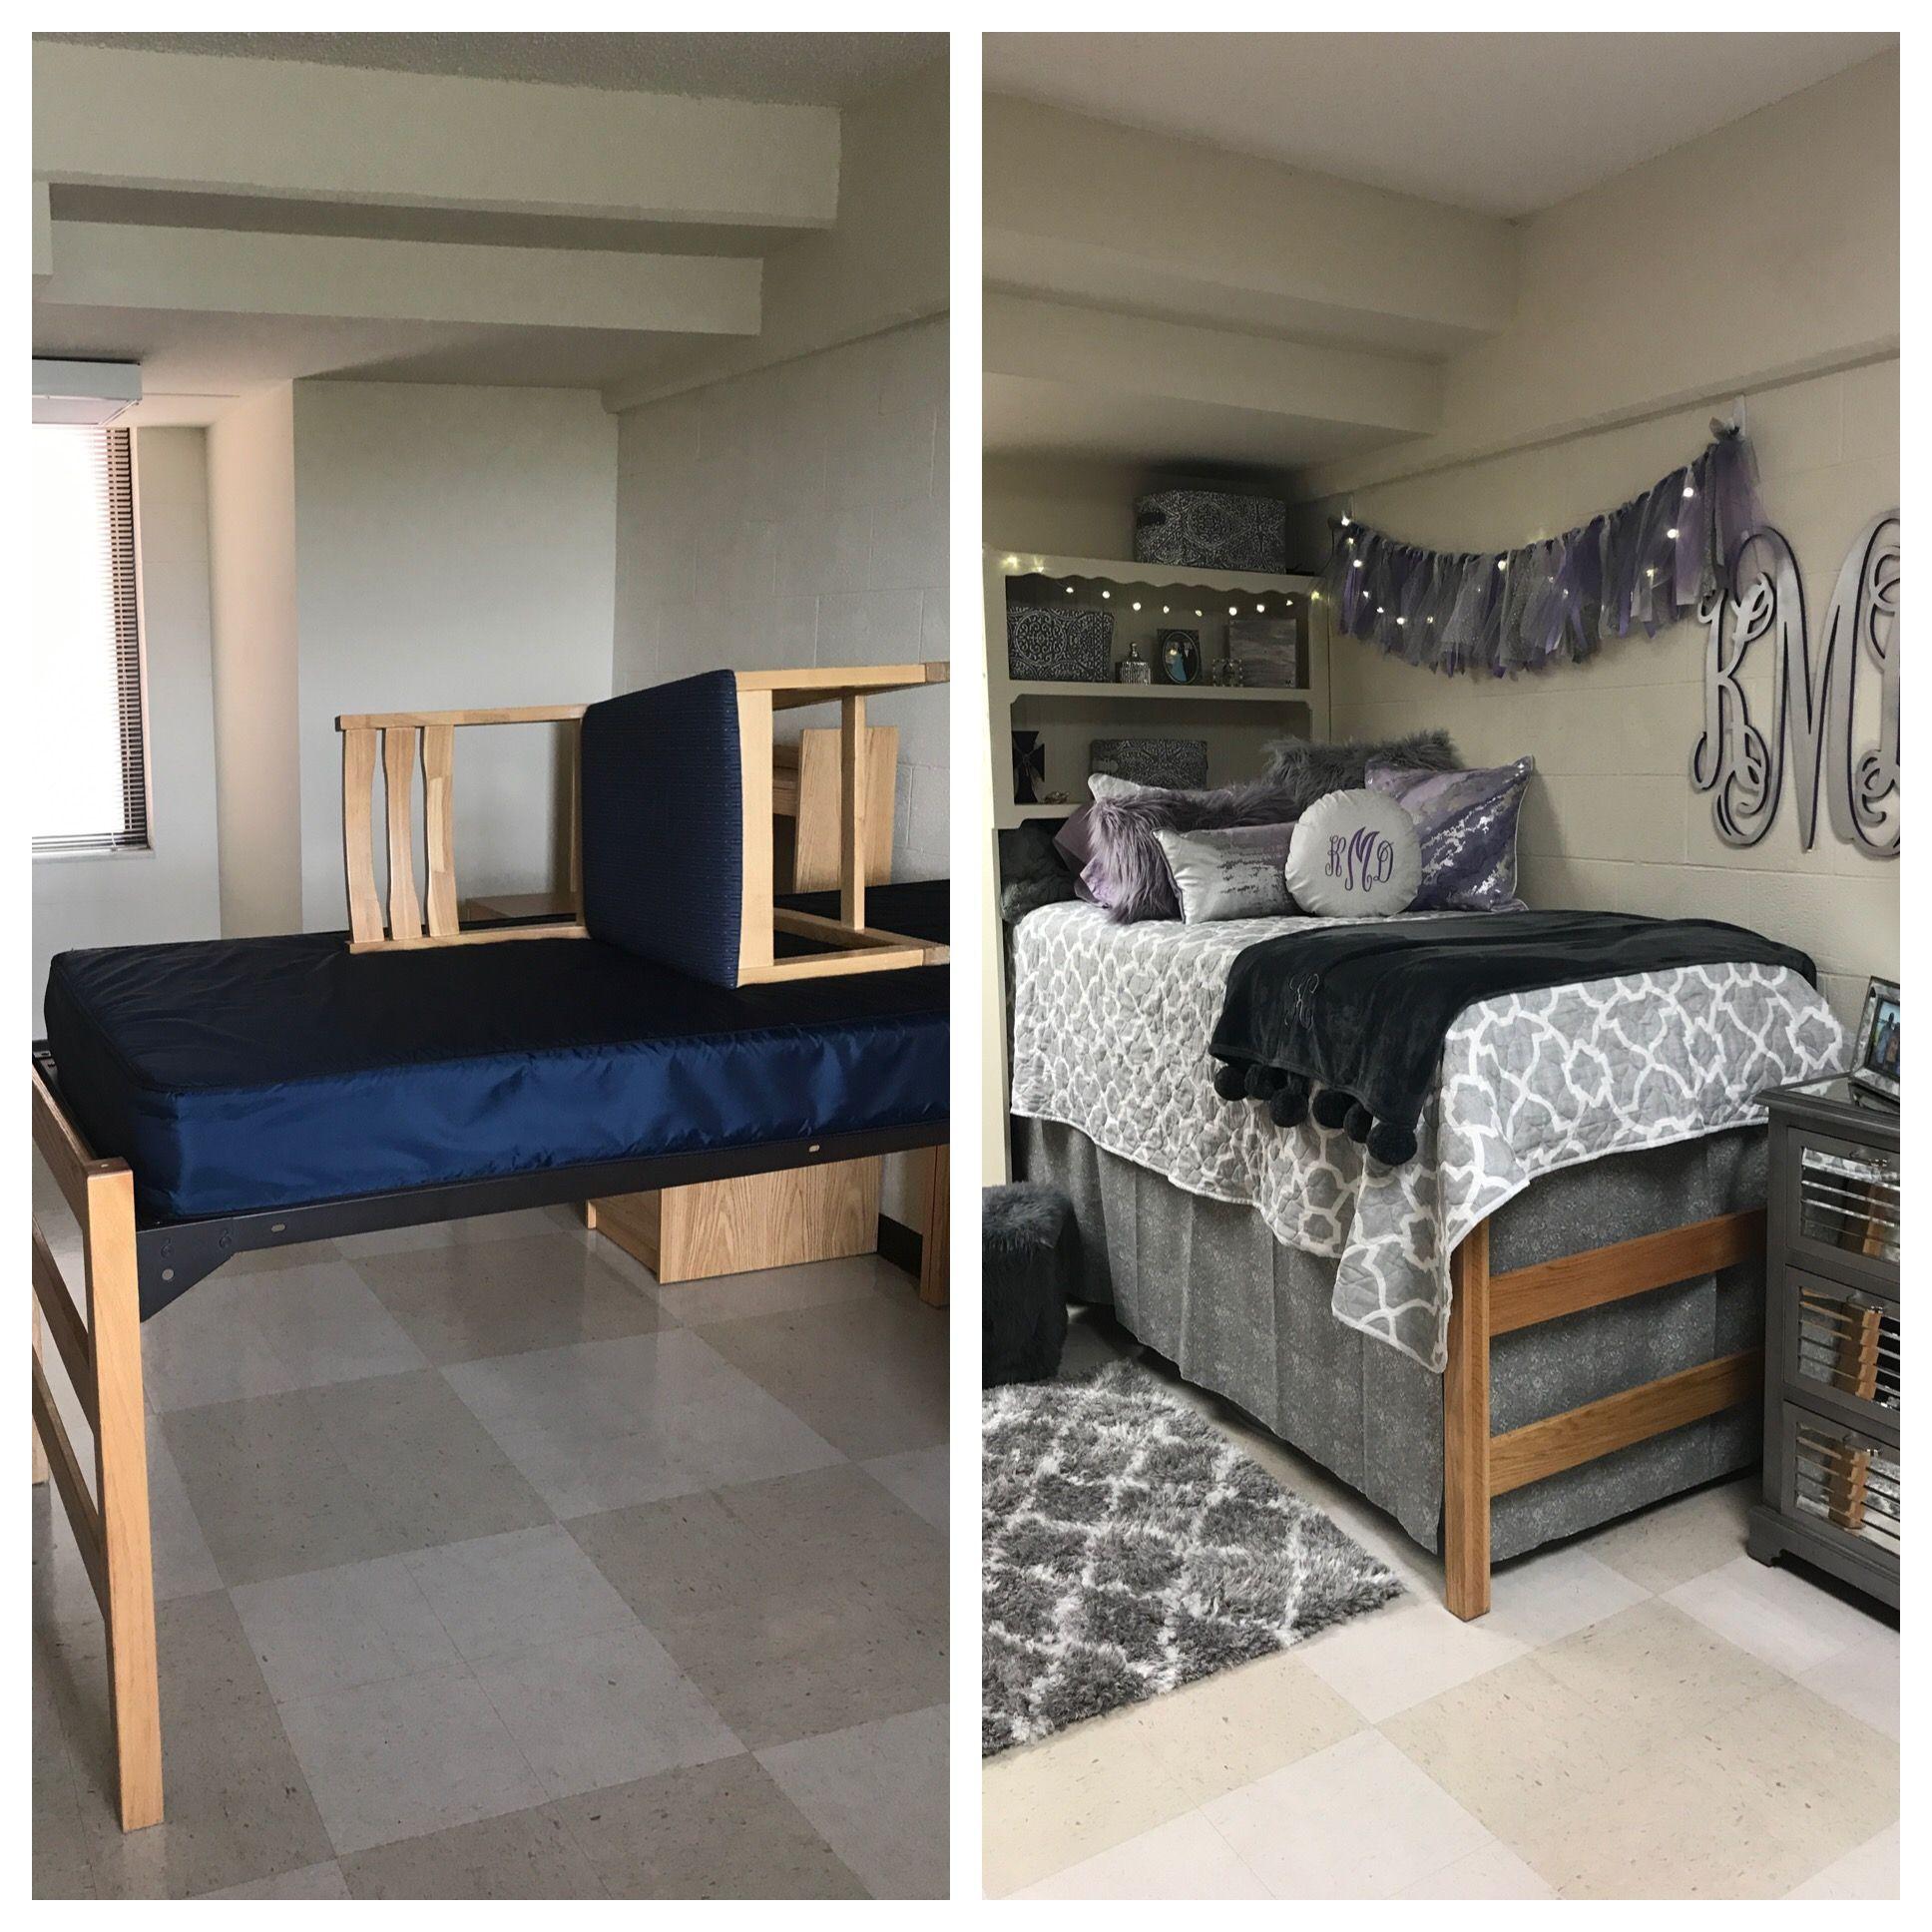 Before And After Mtsu Dorm Makeover Dorm Sweet Dorm Mtsu Dorm Dorm Room Inspiration